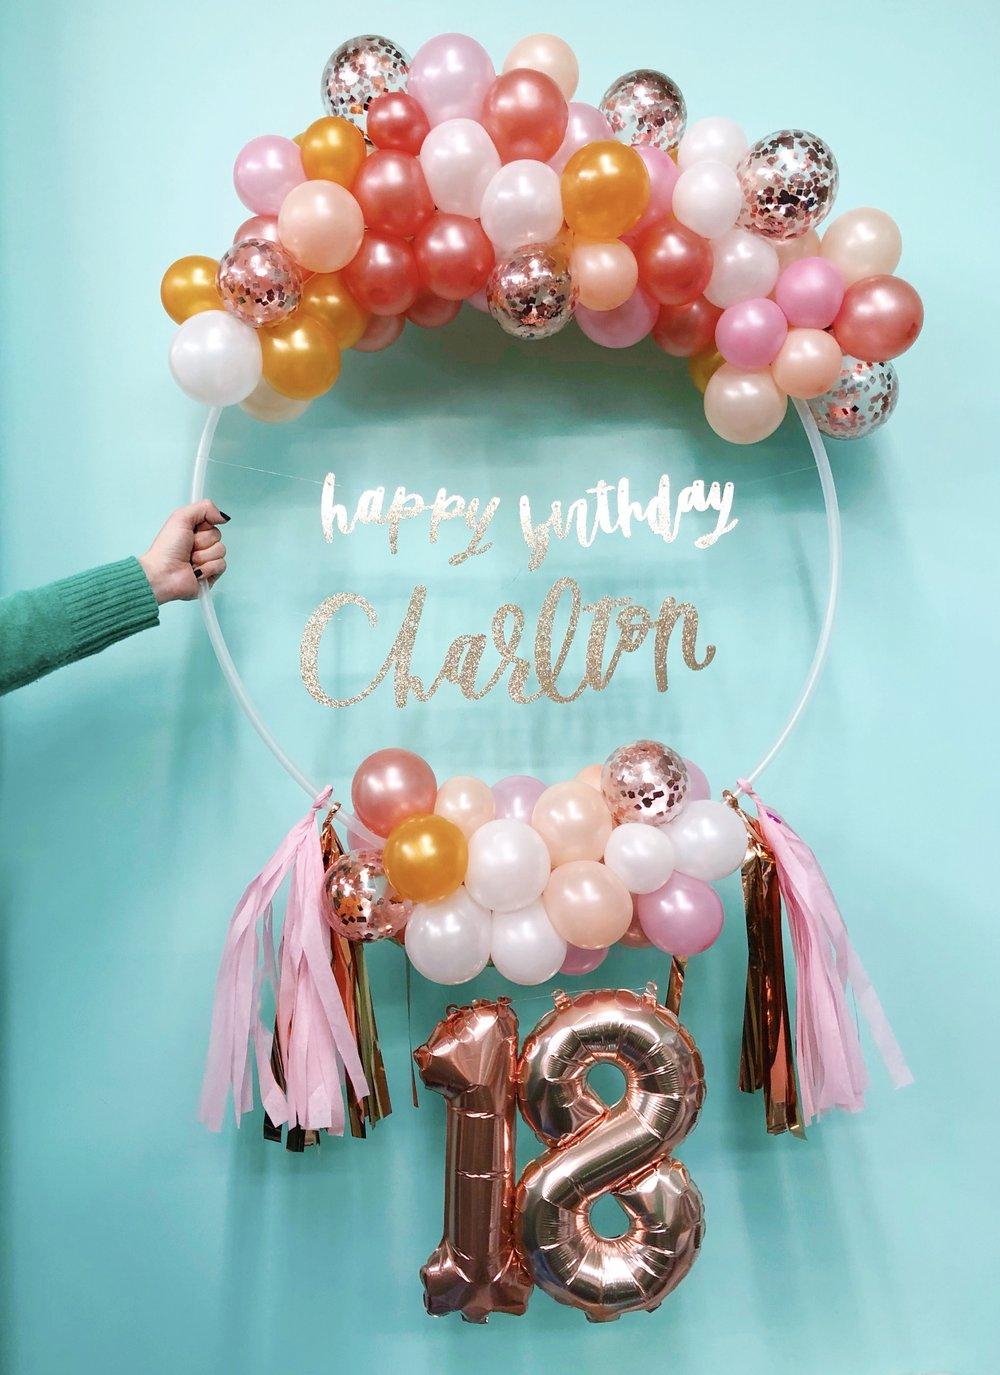 vroom_vroom_balloon_wreath_18_birthday_pink_confetti.jpg